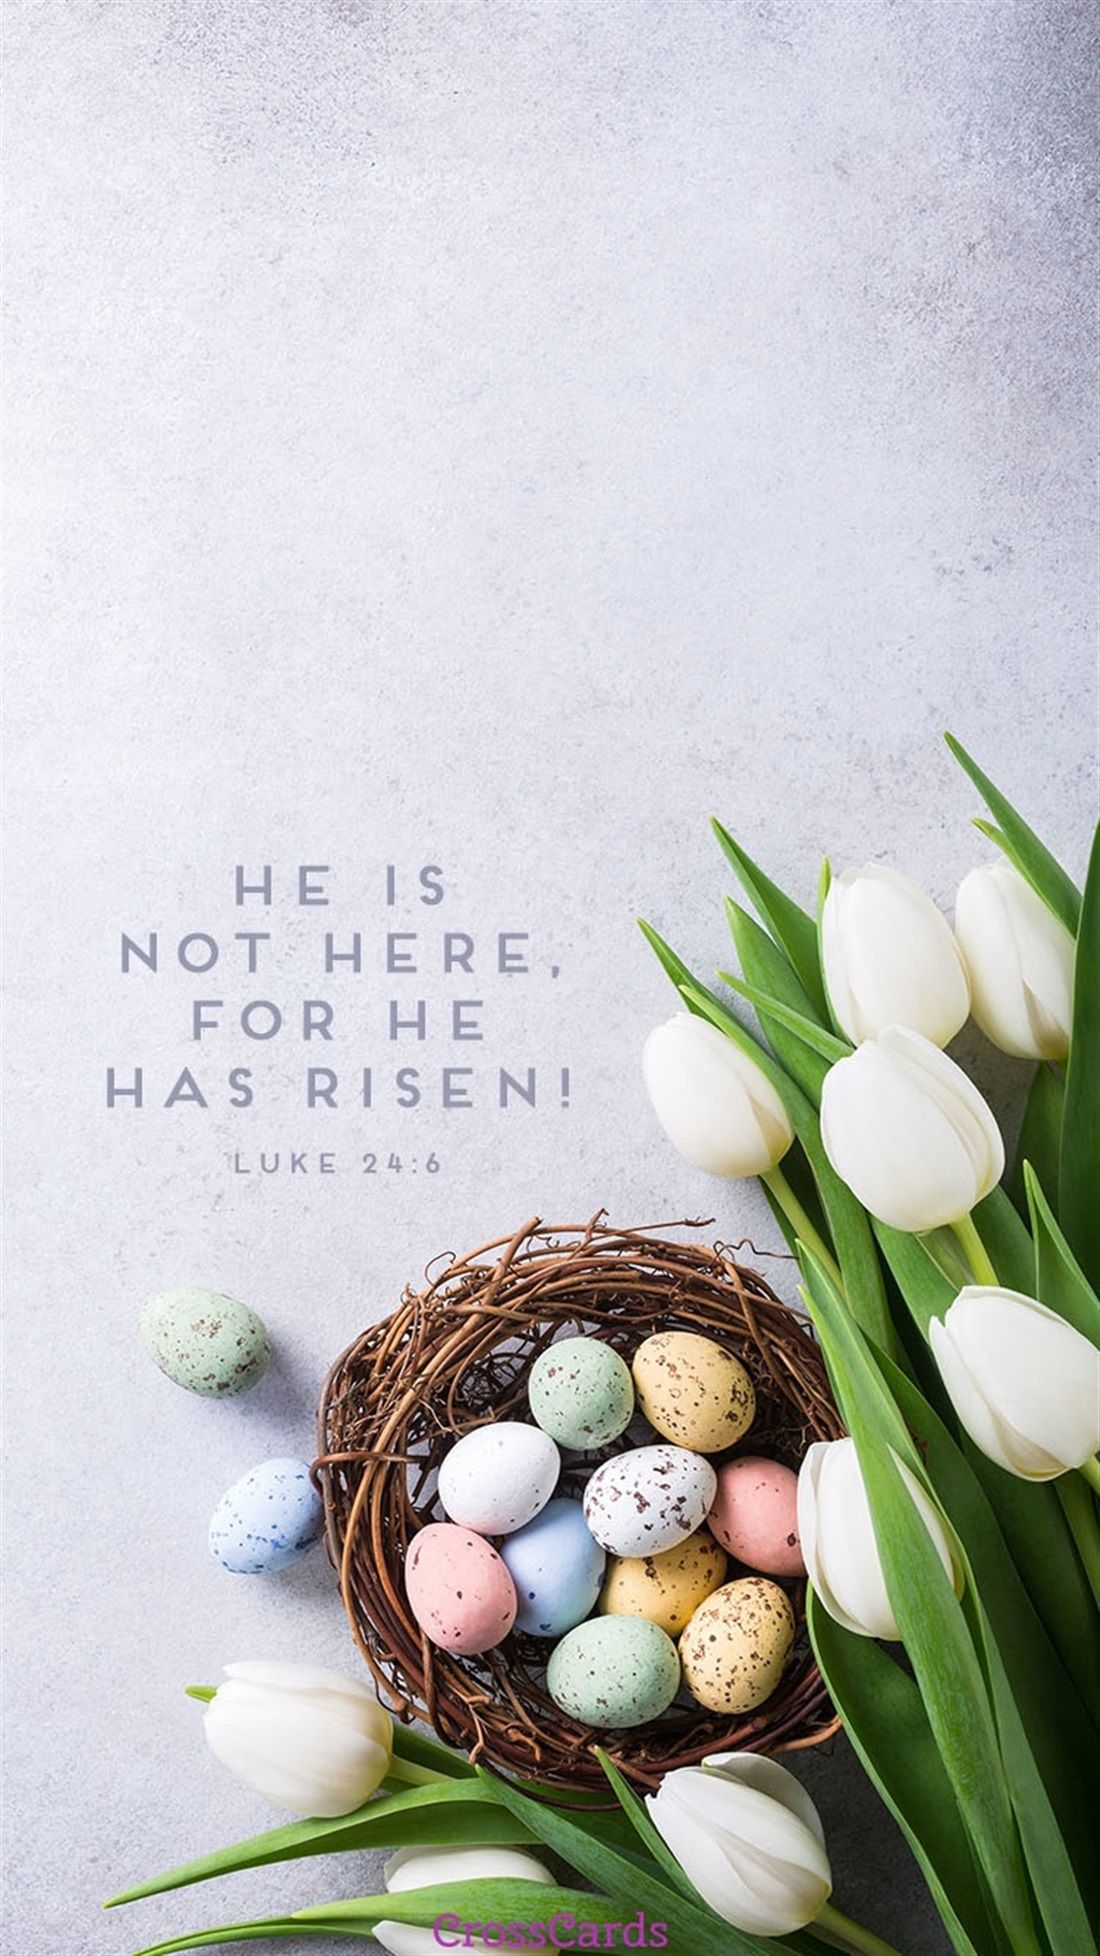 He Has Risen Mobile Phone Wallpaper In 2019 Easter